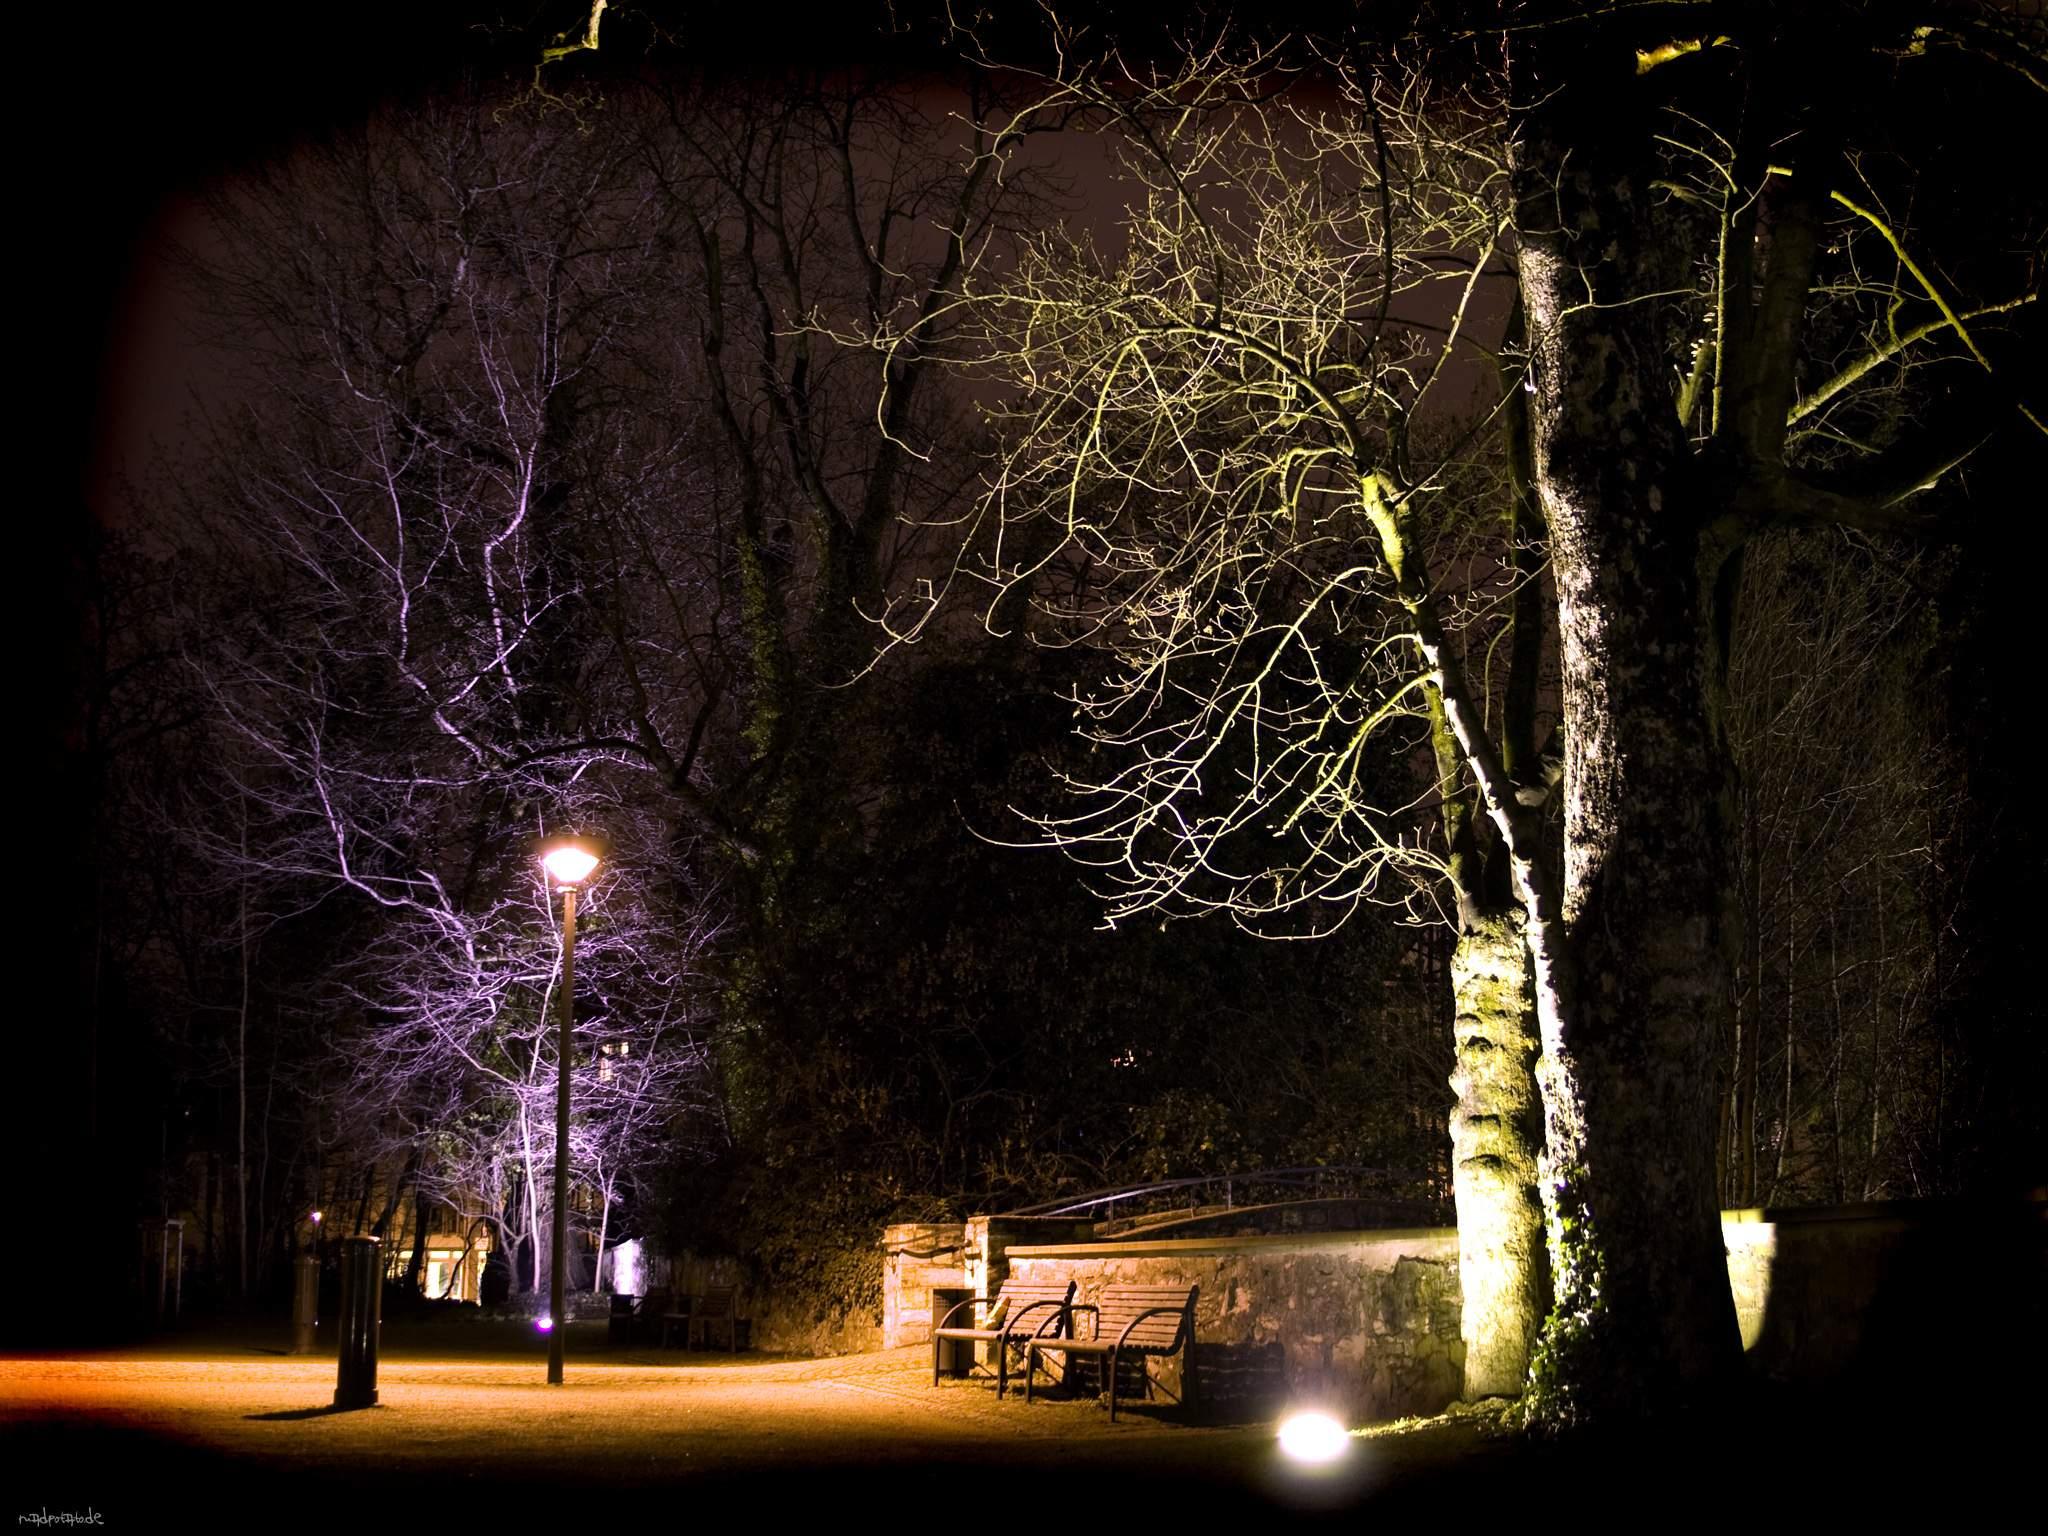 NightShot_6_2048.jpg